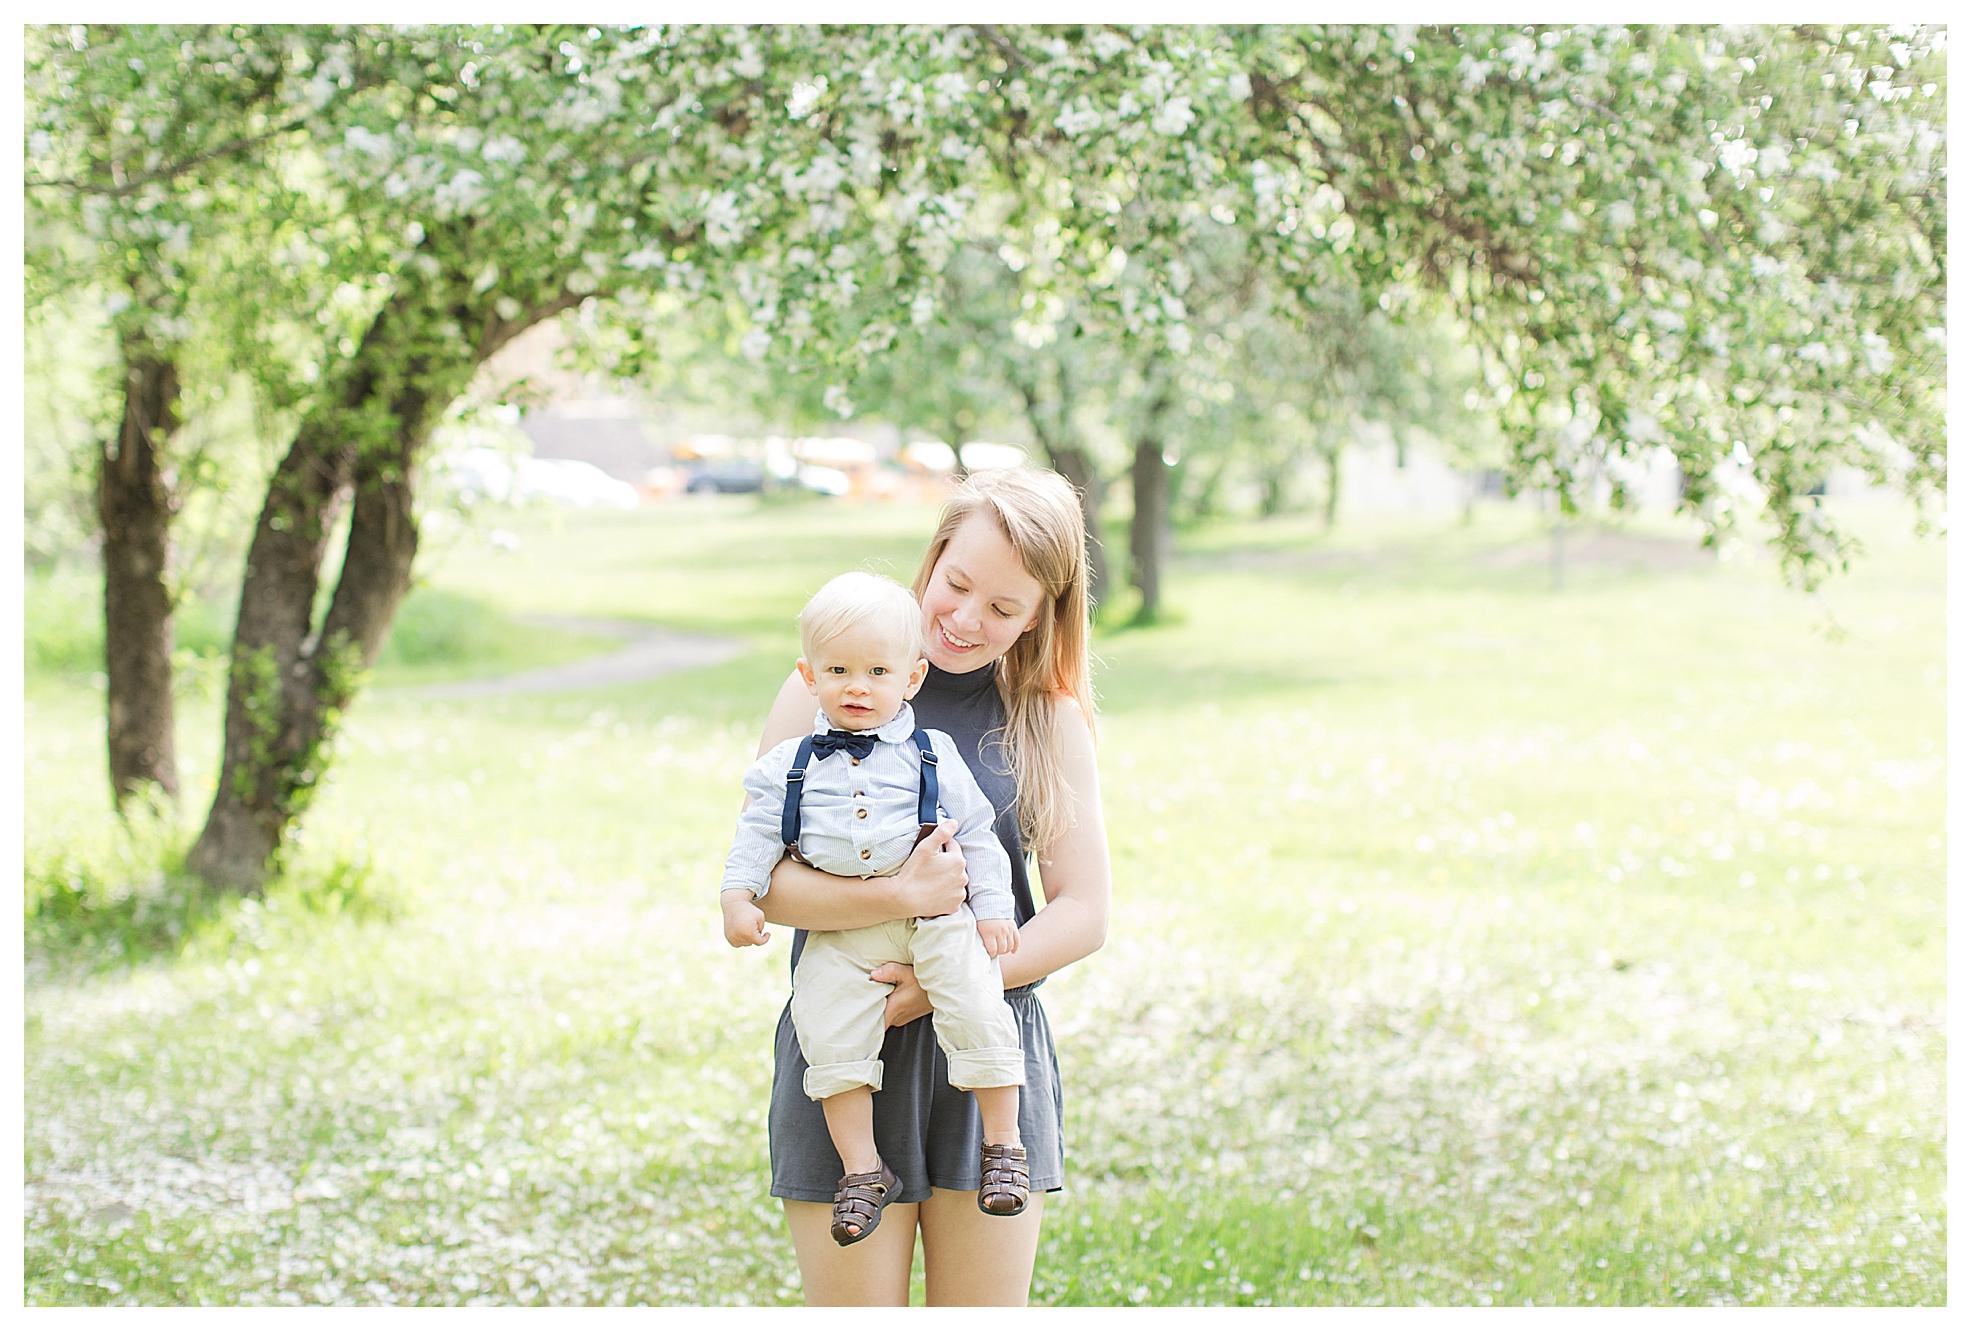 Houghton County Family Photographer_0009.jpg